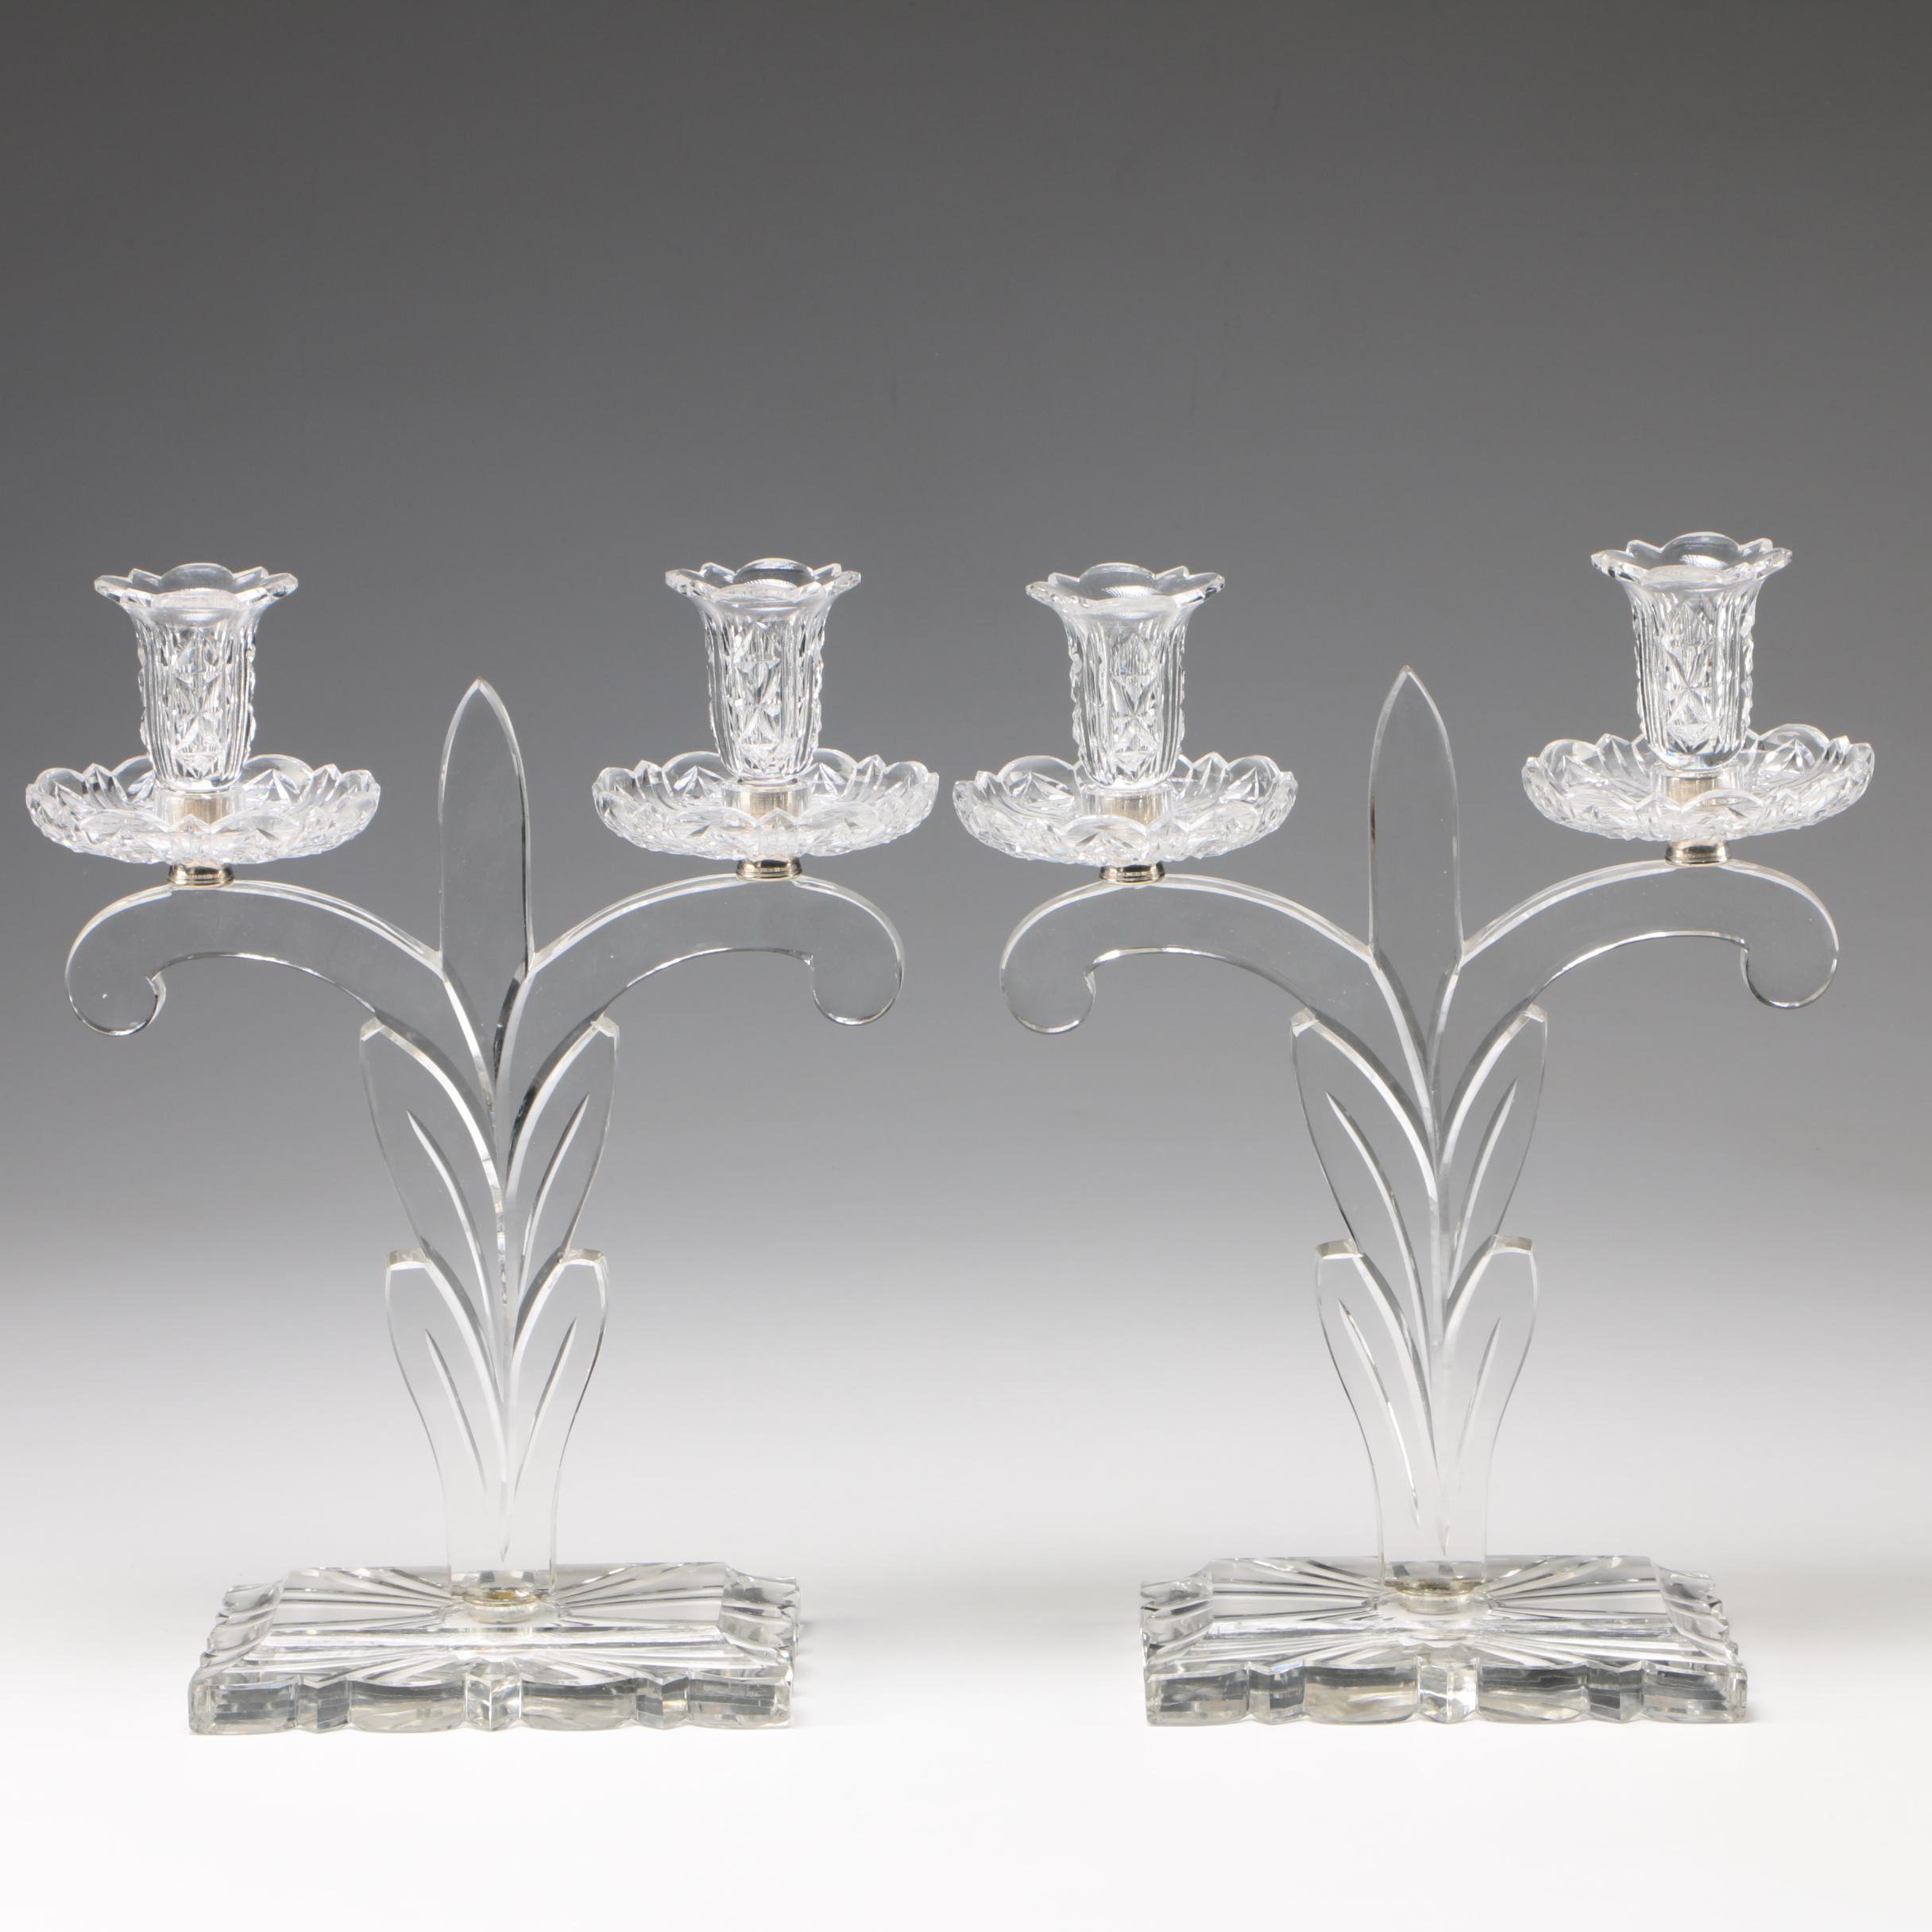 Steuben Art Glass Fleur-de-Lis Candleabra by Frederick Carder